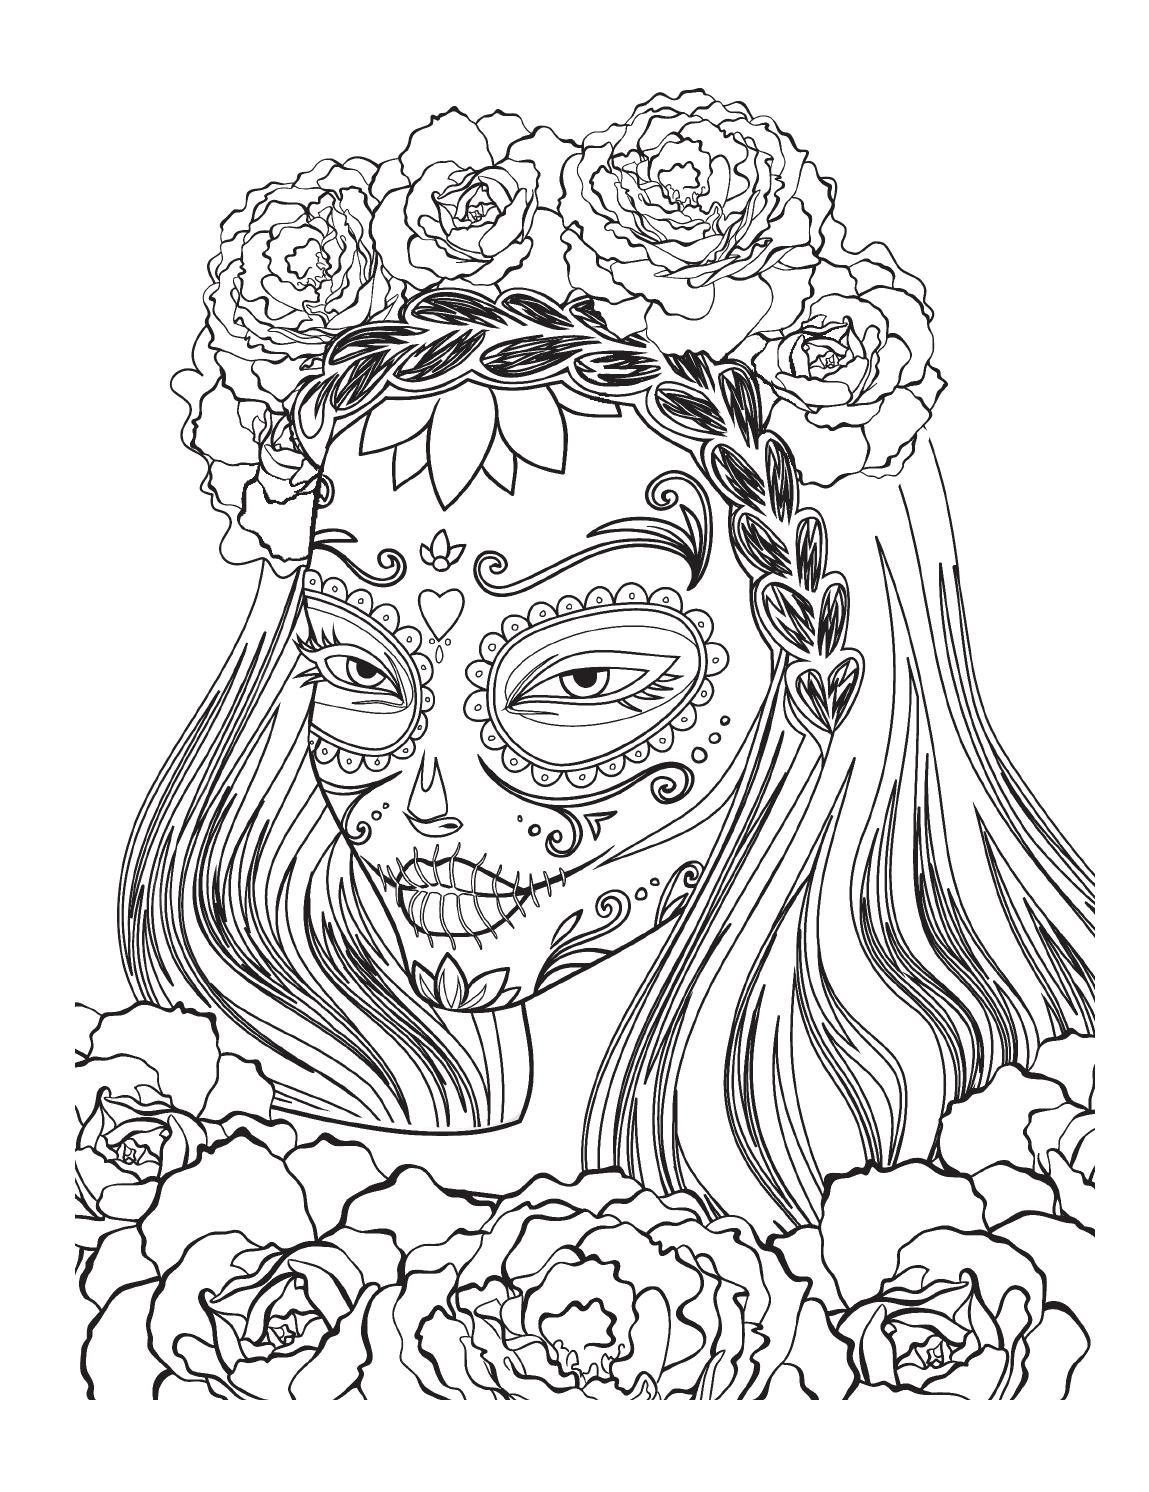 Drawing Corpse Bride Pumpkin Patterns